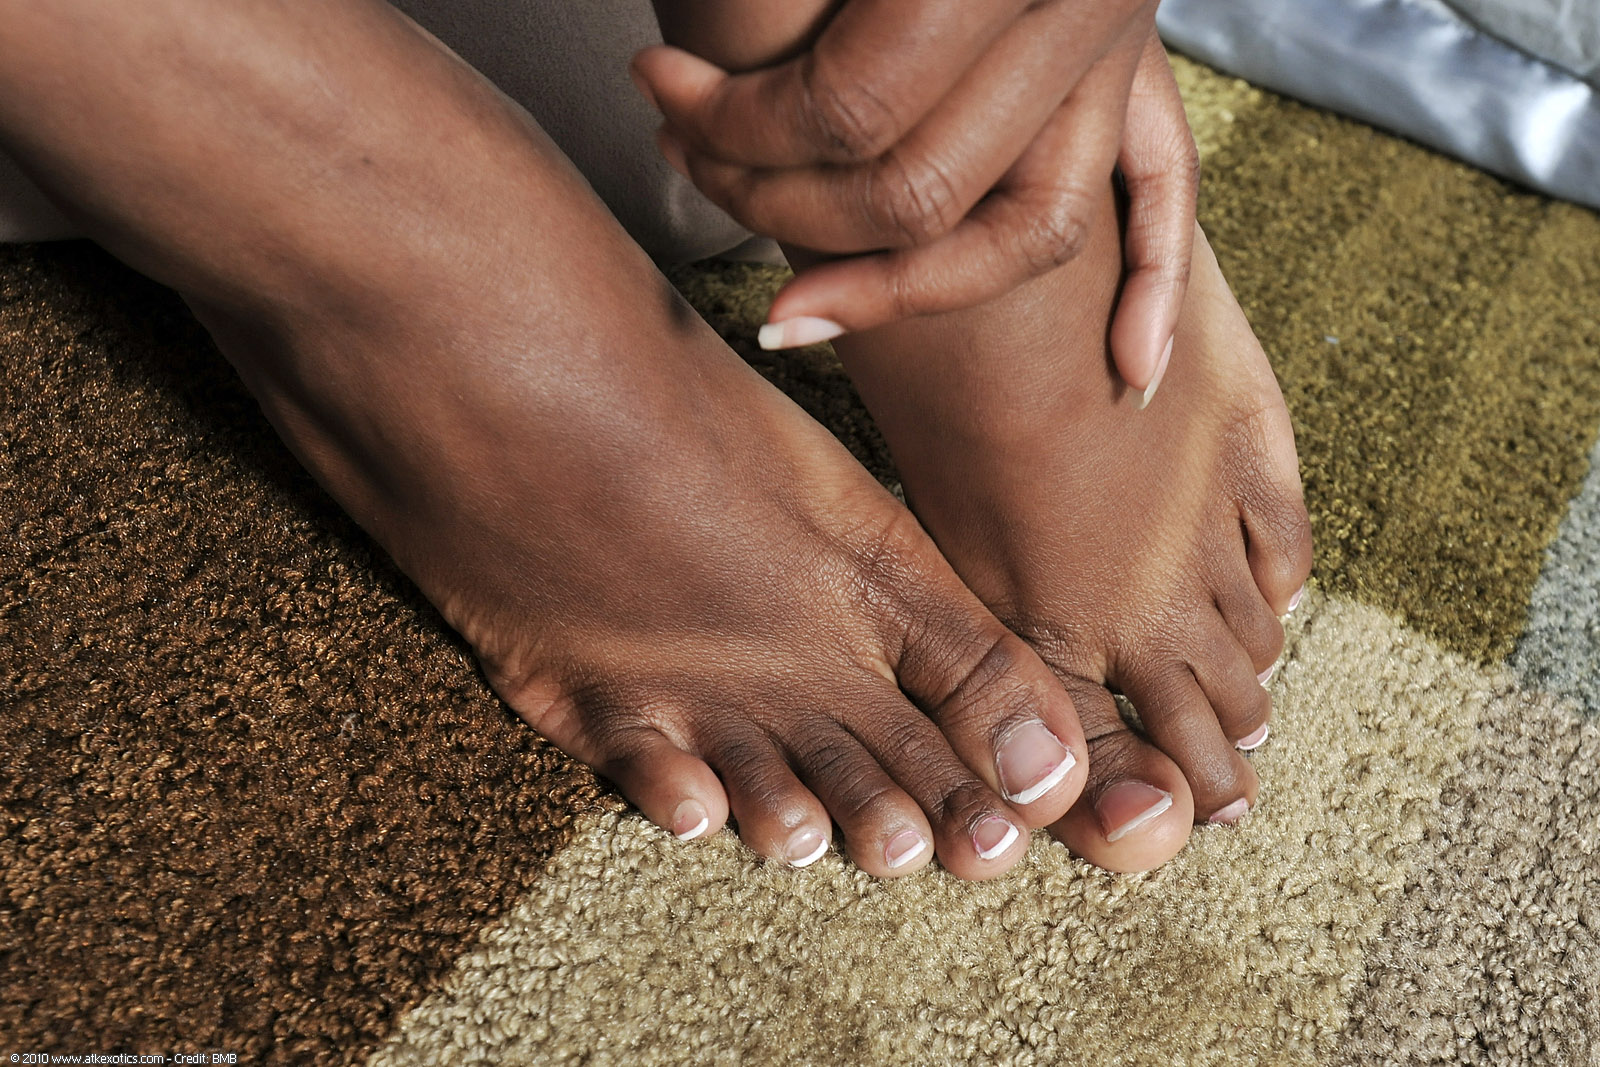 dark panthera ebony feet